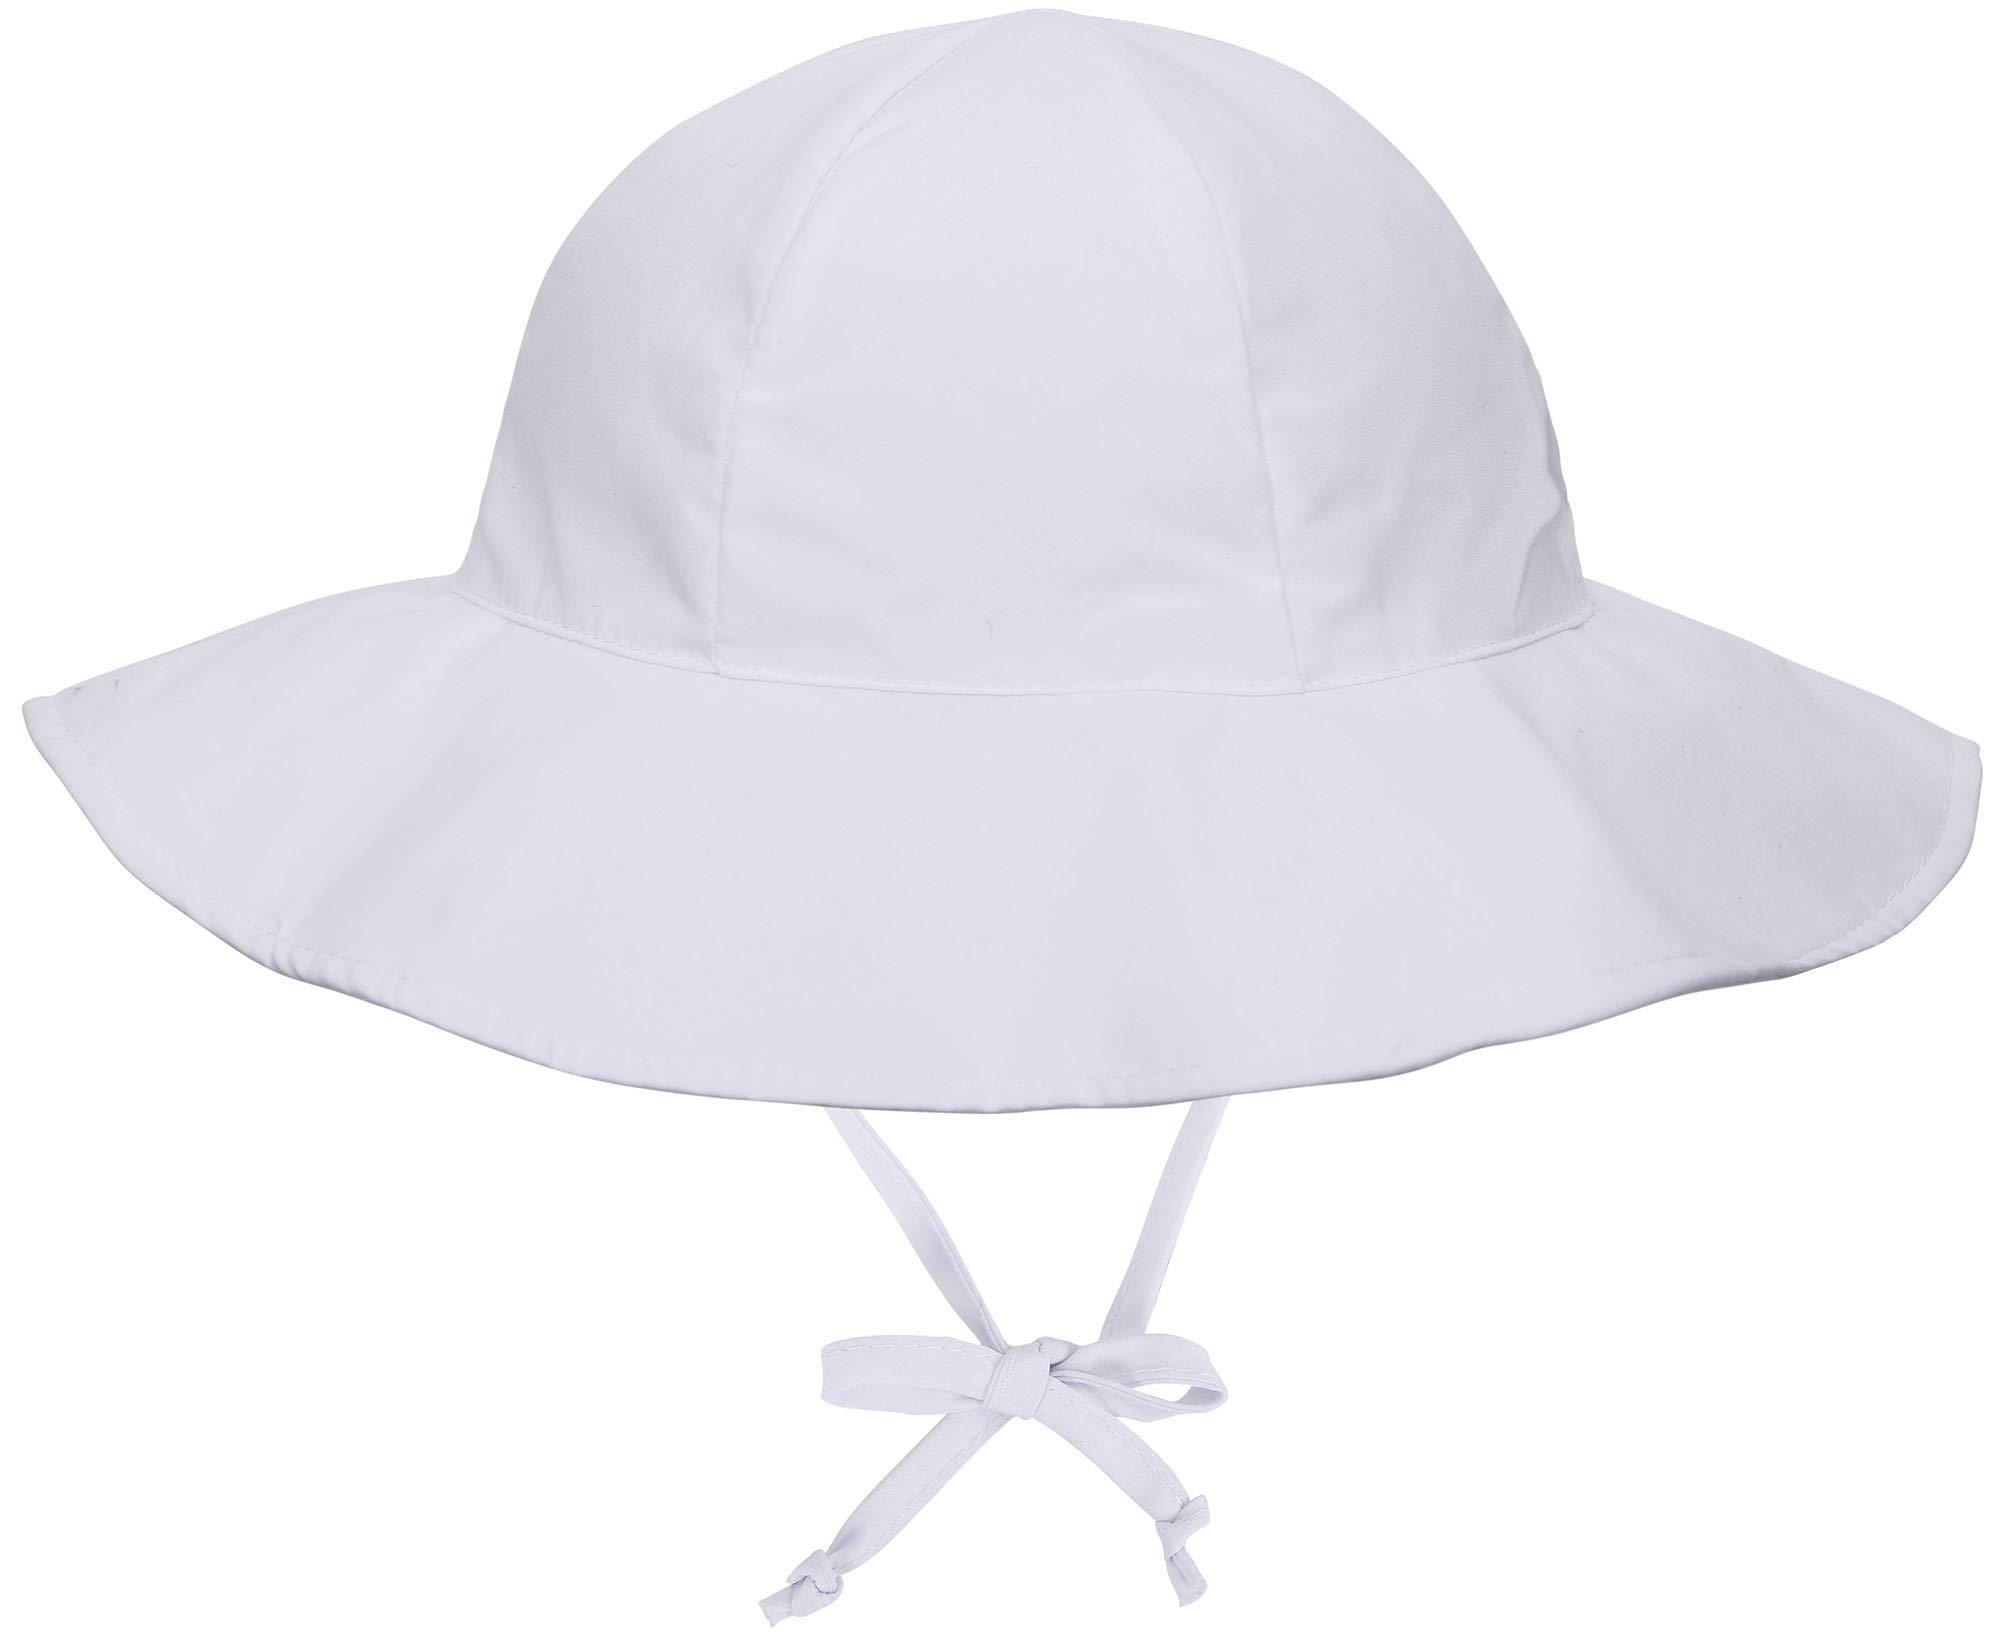 SimpliKids UPF 50+ UV Ray Sun Protection Wide Brim Baby Sun Hat,White,12-24 Months